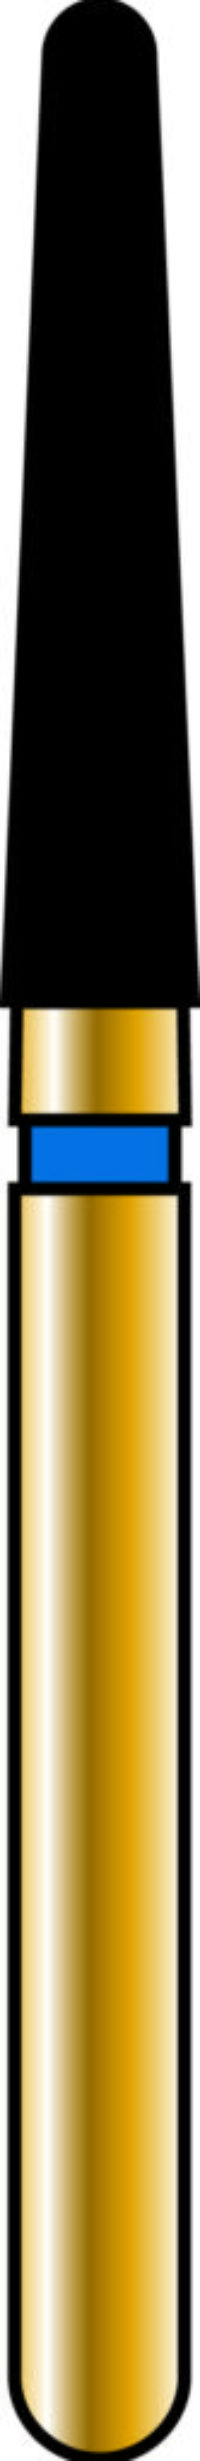 Round End Taper 18-9mm Gold Diamond Bur